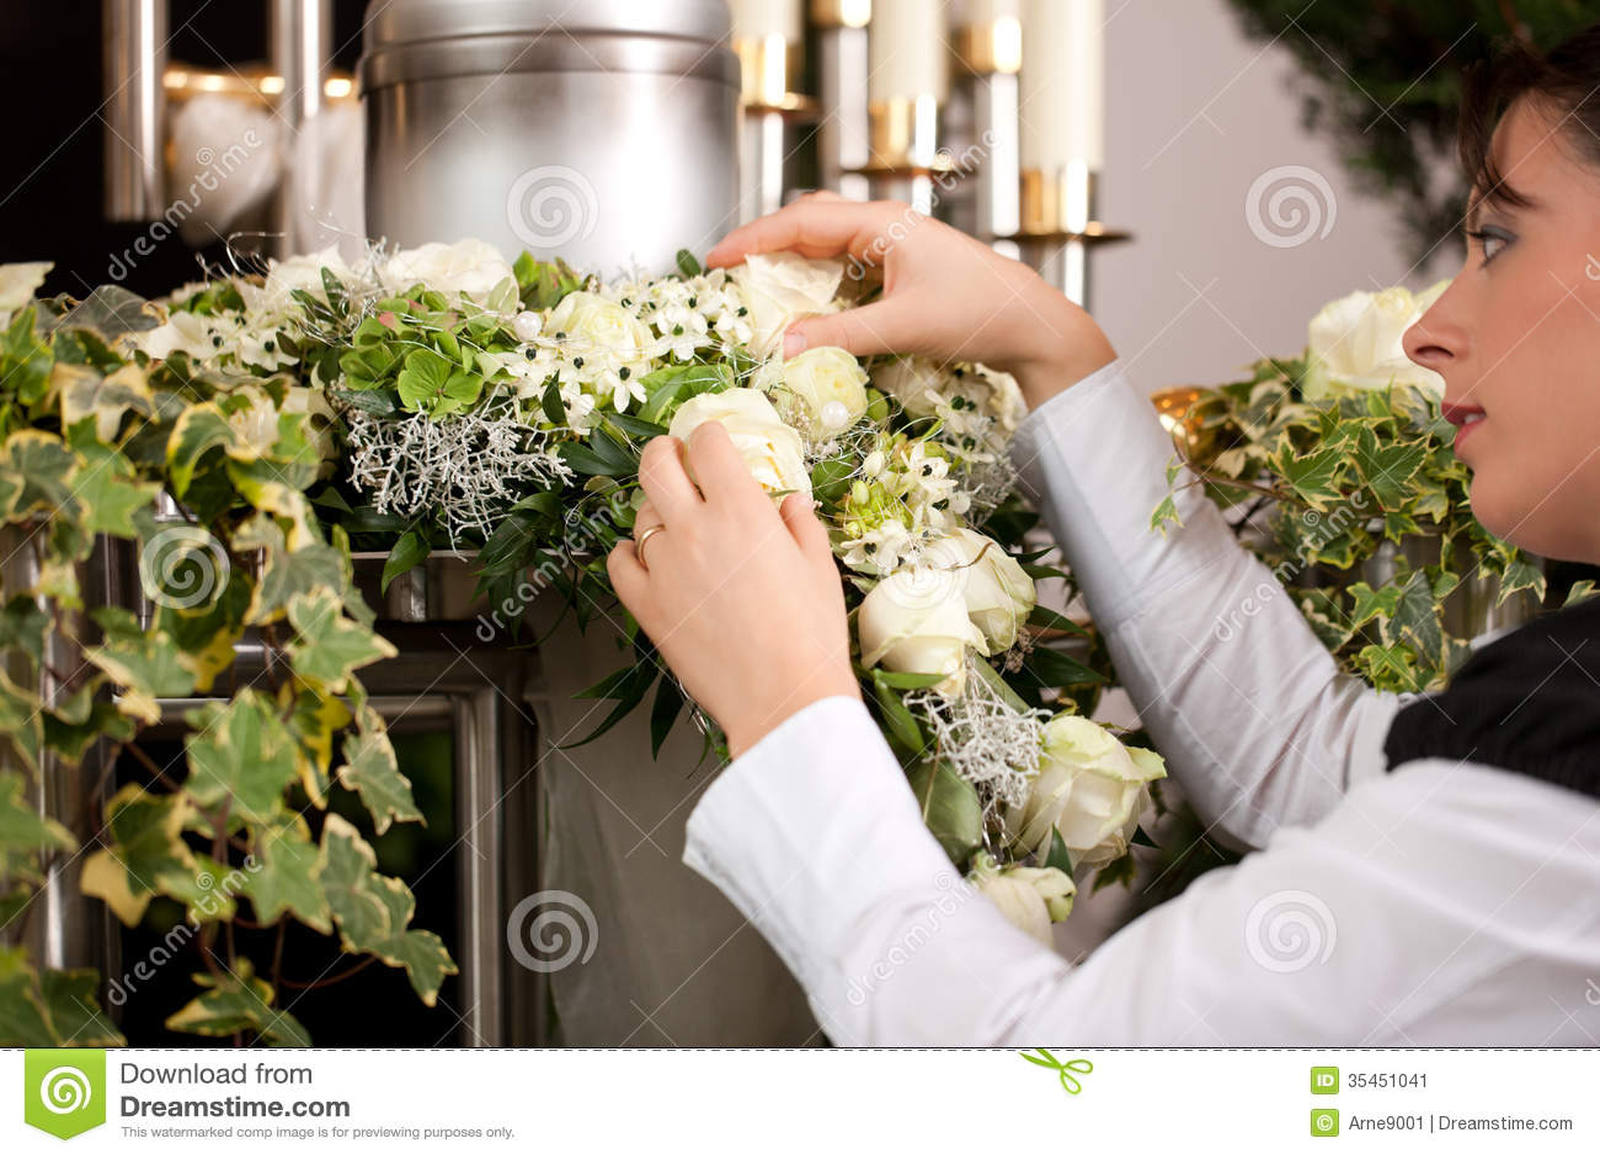 Grief - female mortician preparing urn Funeral